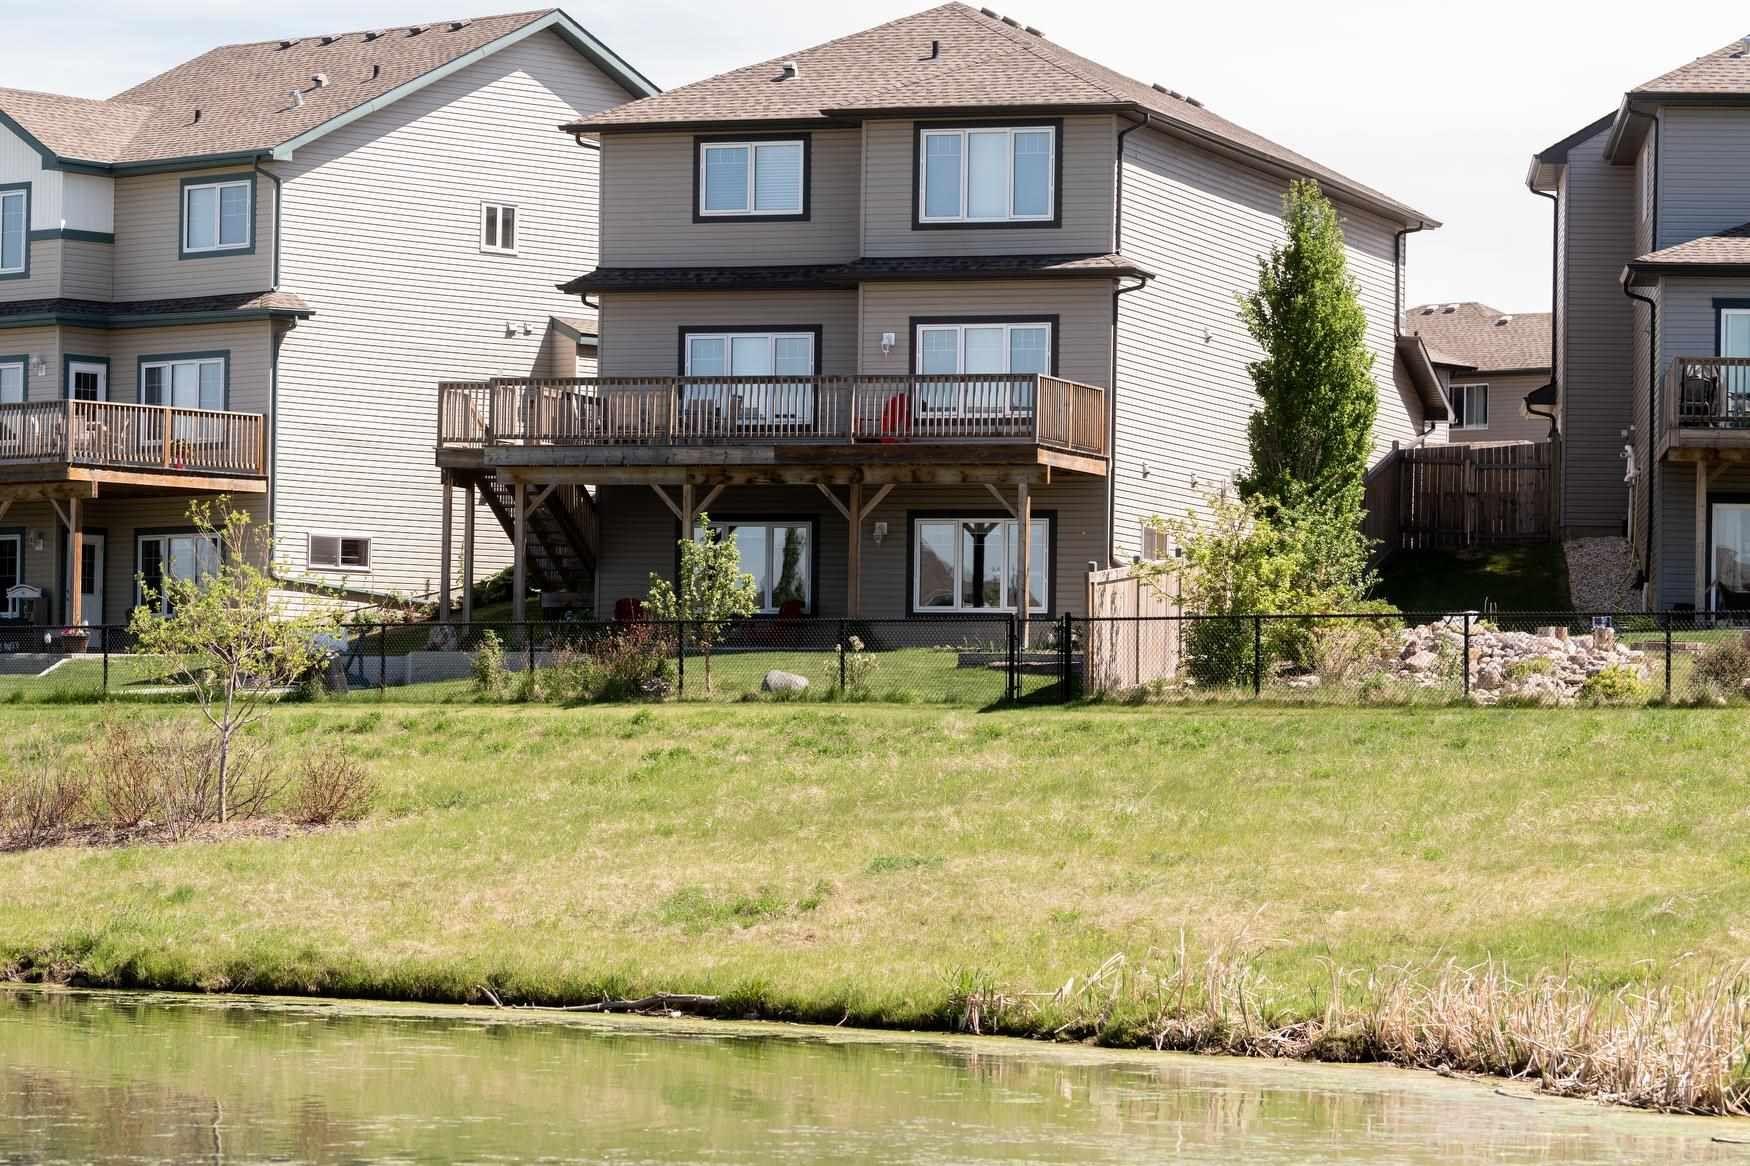 Main Photo: 540 56 Street in Edmonton: Zone 53 House for sale : MLS®# E4254680